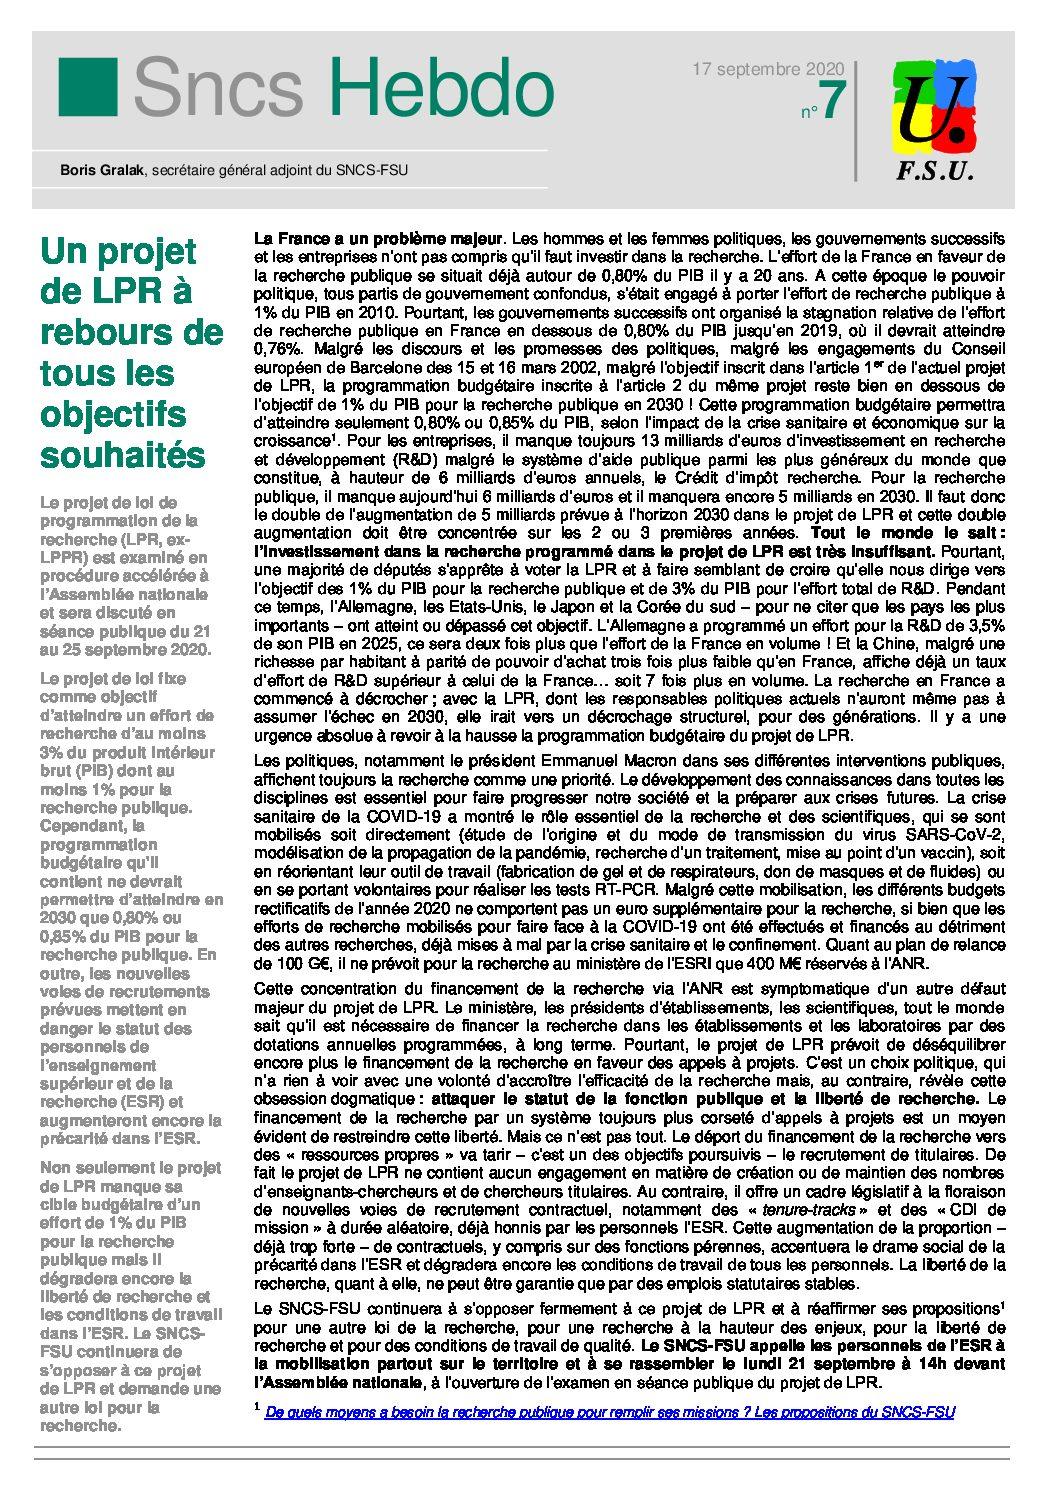 SNCS-hebdo_projet-LPR-1-pdf.jpg